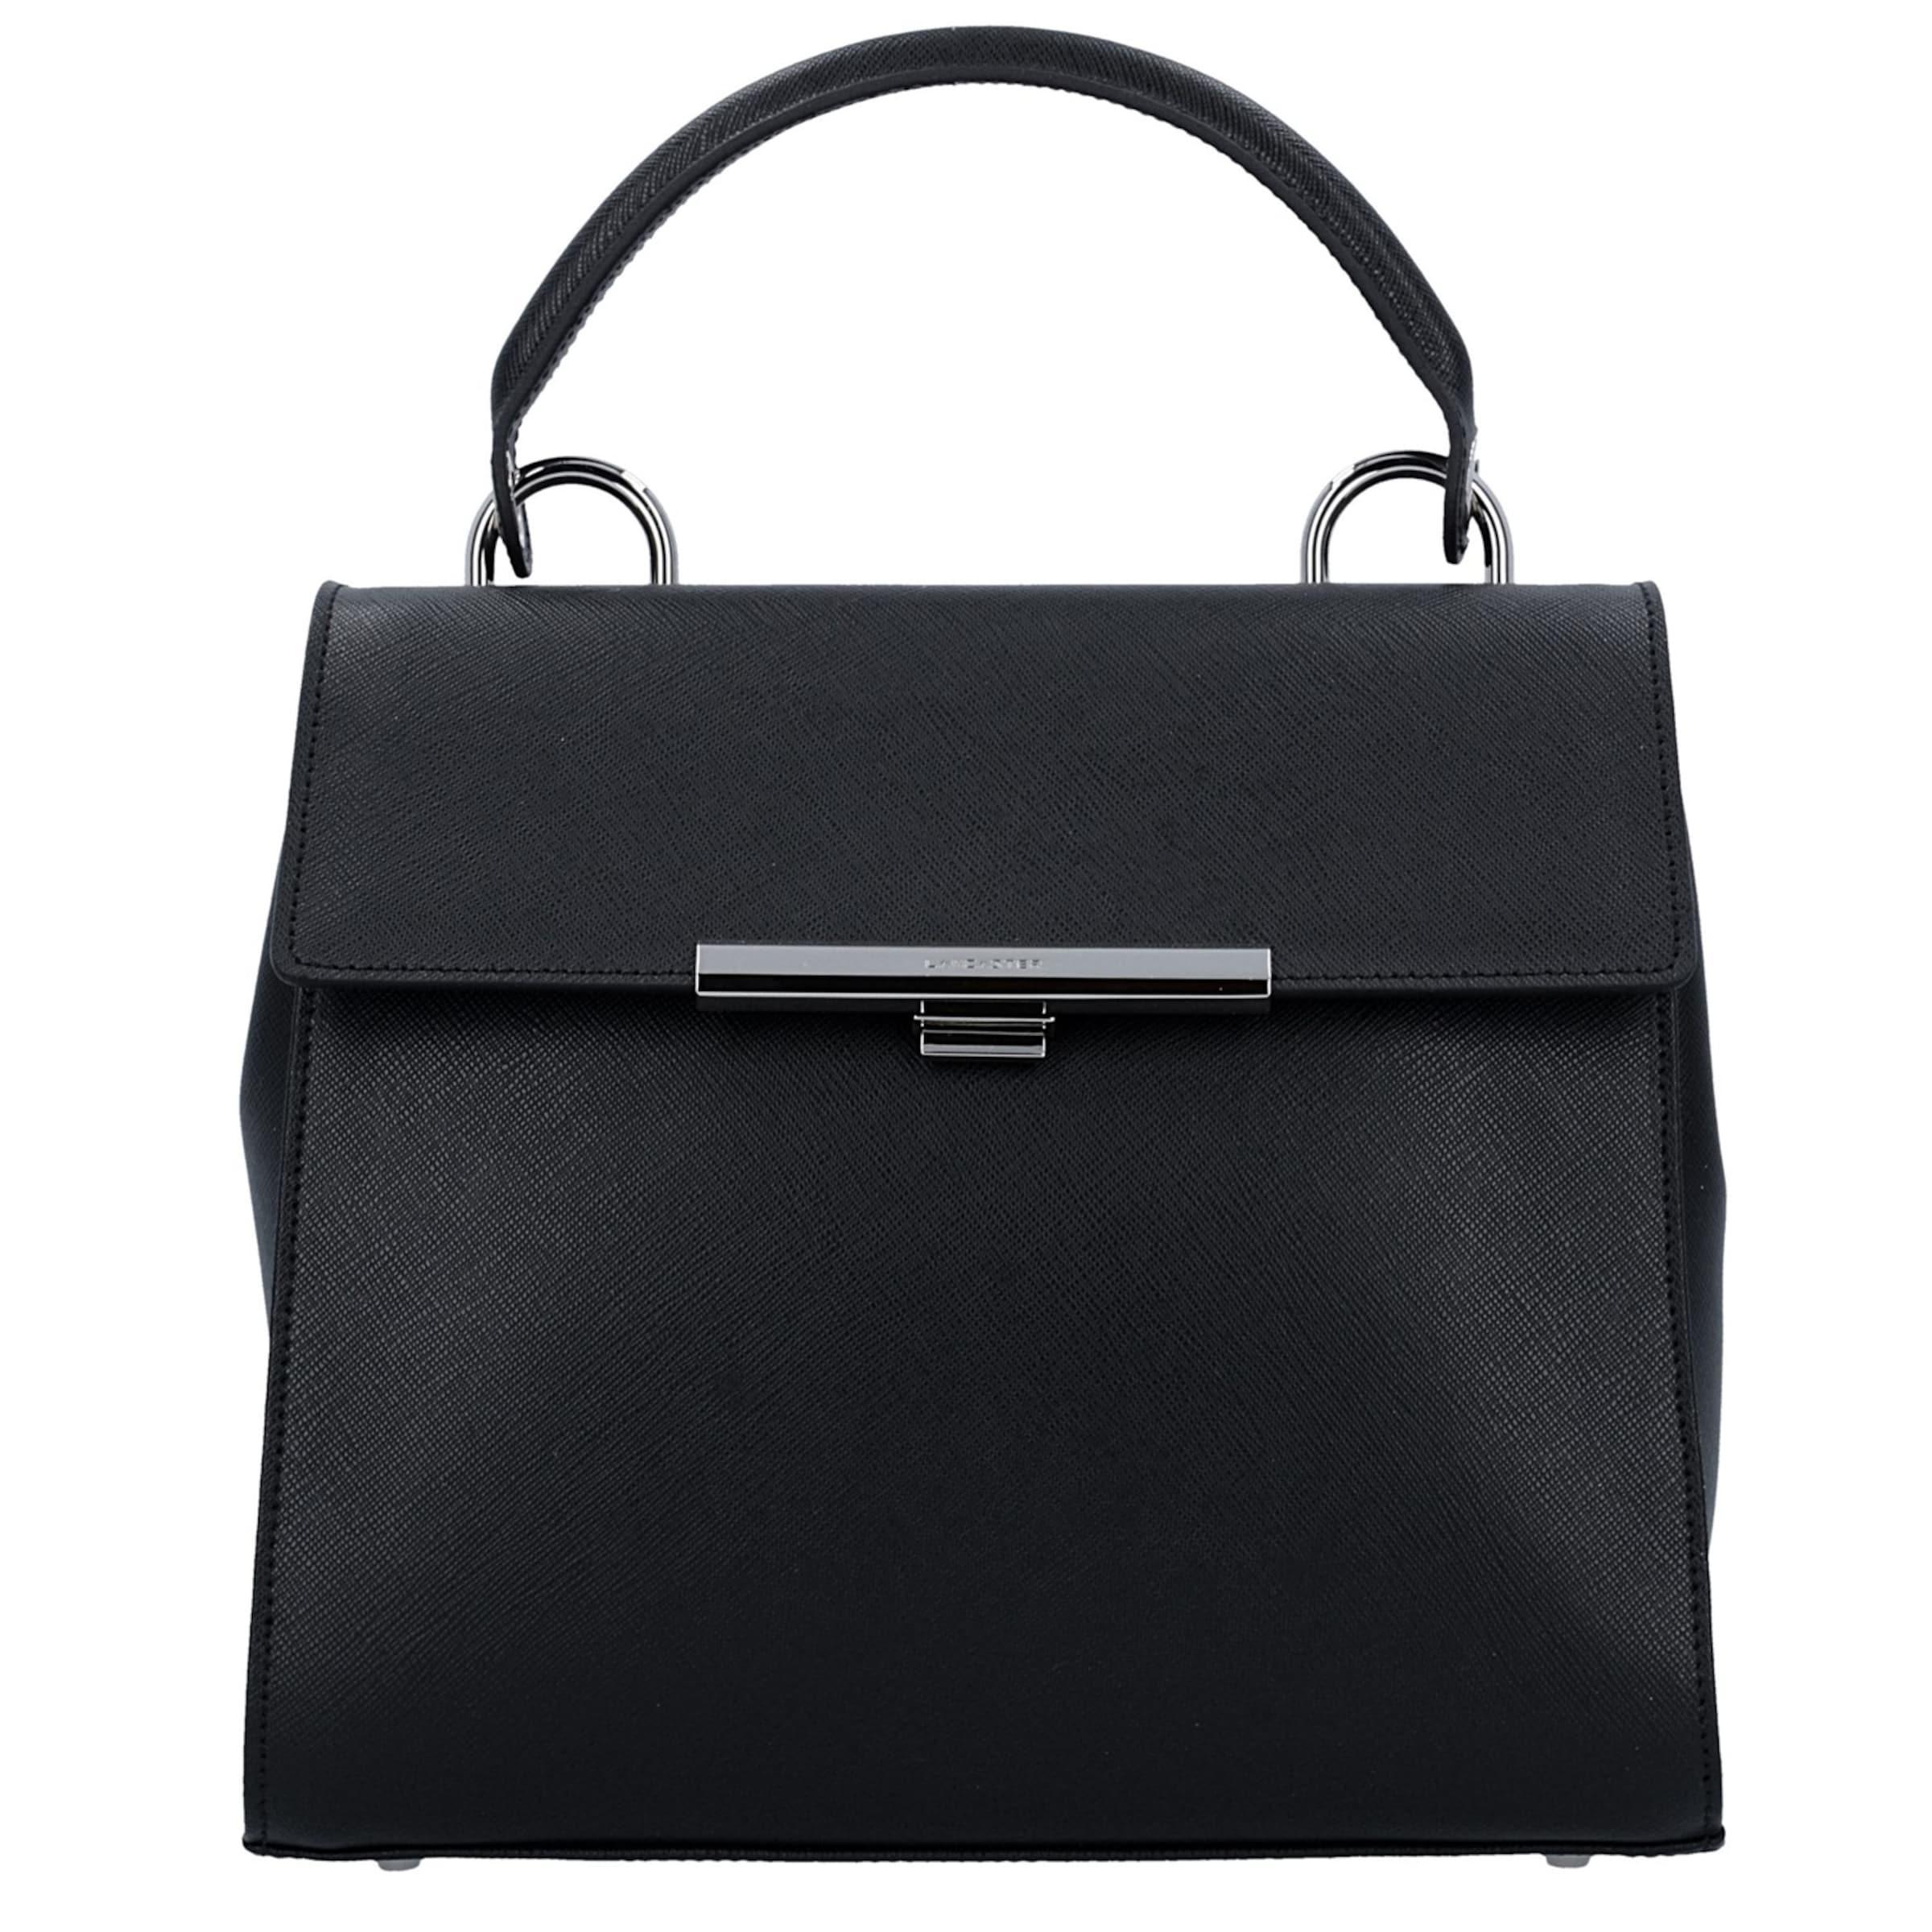 LANCASTER Sac A Main A Rabat Handtasche Leder 26 cm Extrem Günstiger Preis 1Wam7dP